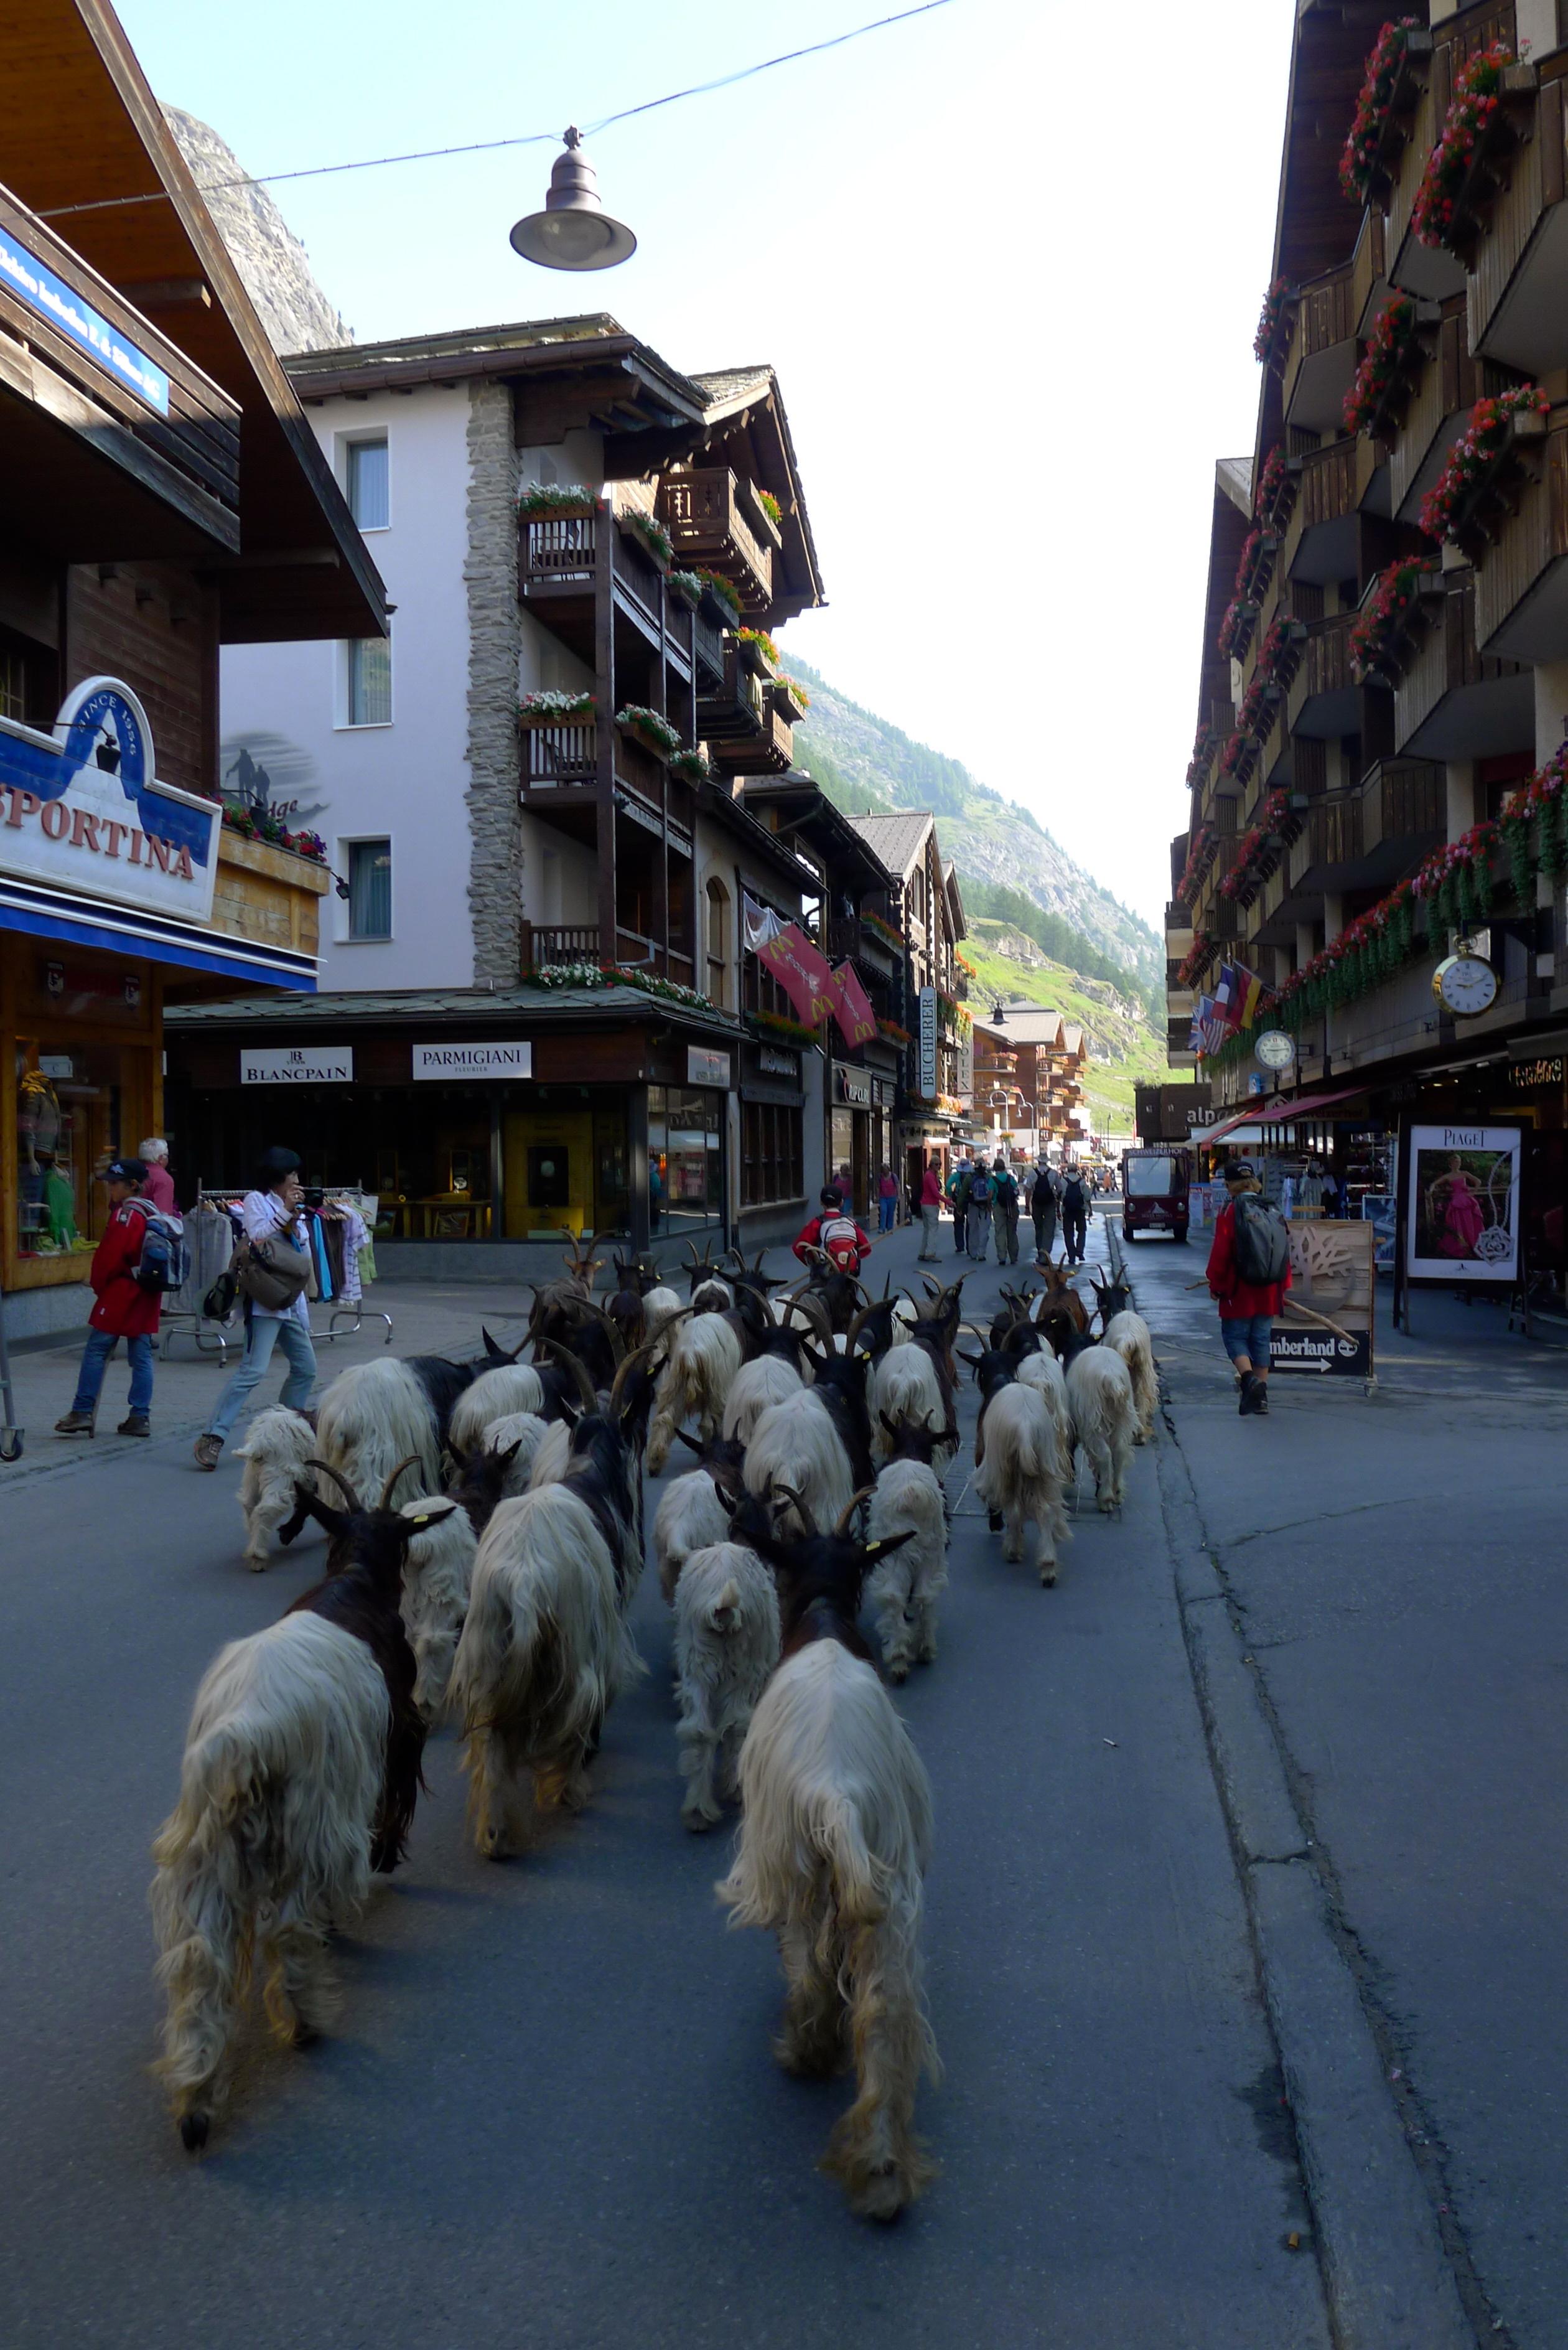 Swiss Alps hiking, the town of Zermatt